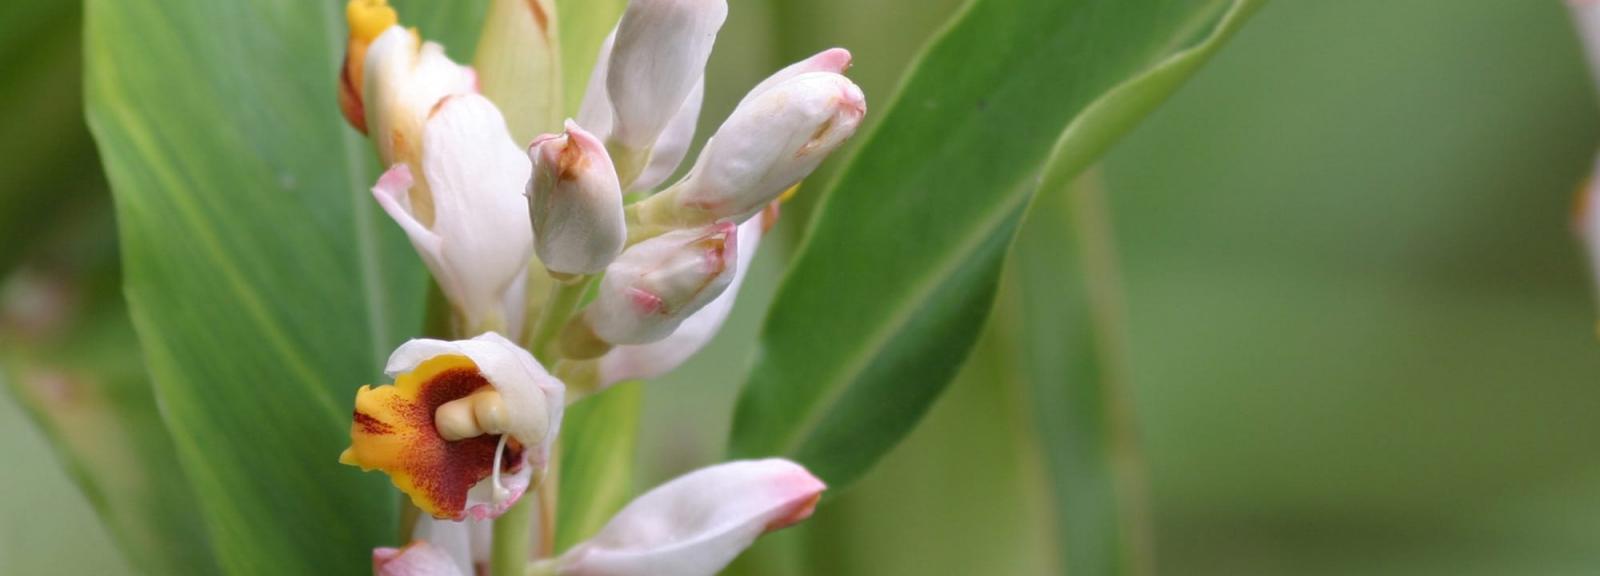 Cardamone (Elettaria cardamomum) - Jardin botanique Val Rahmeh-Menton © MNHN - Christophe Joulin